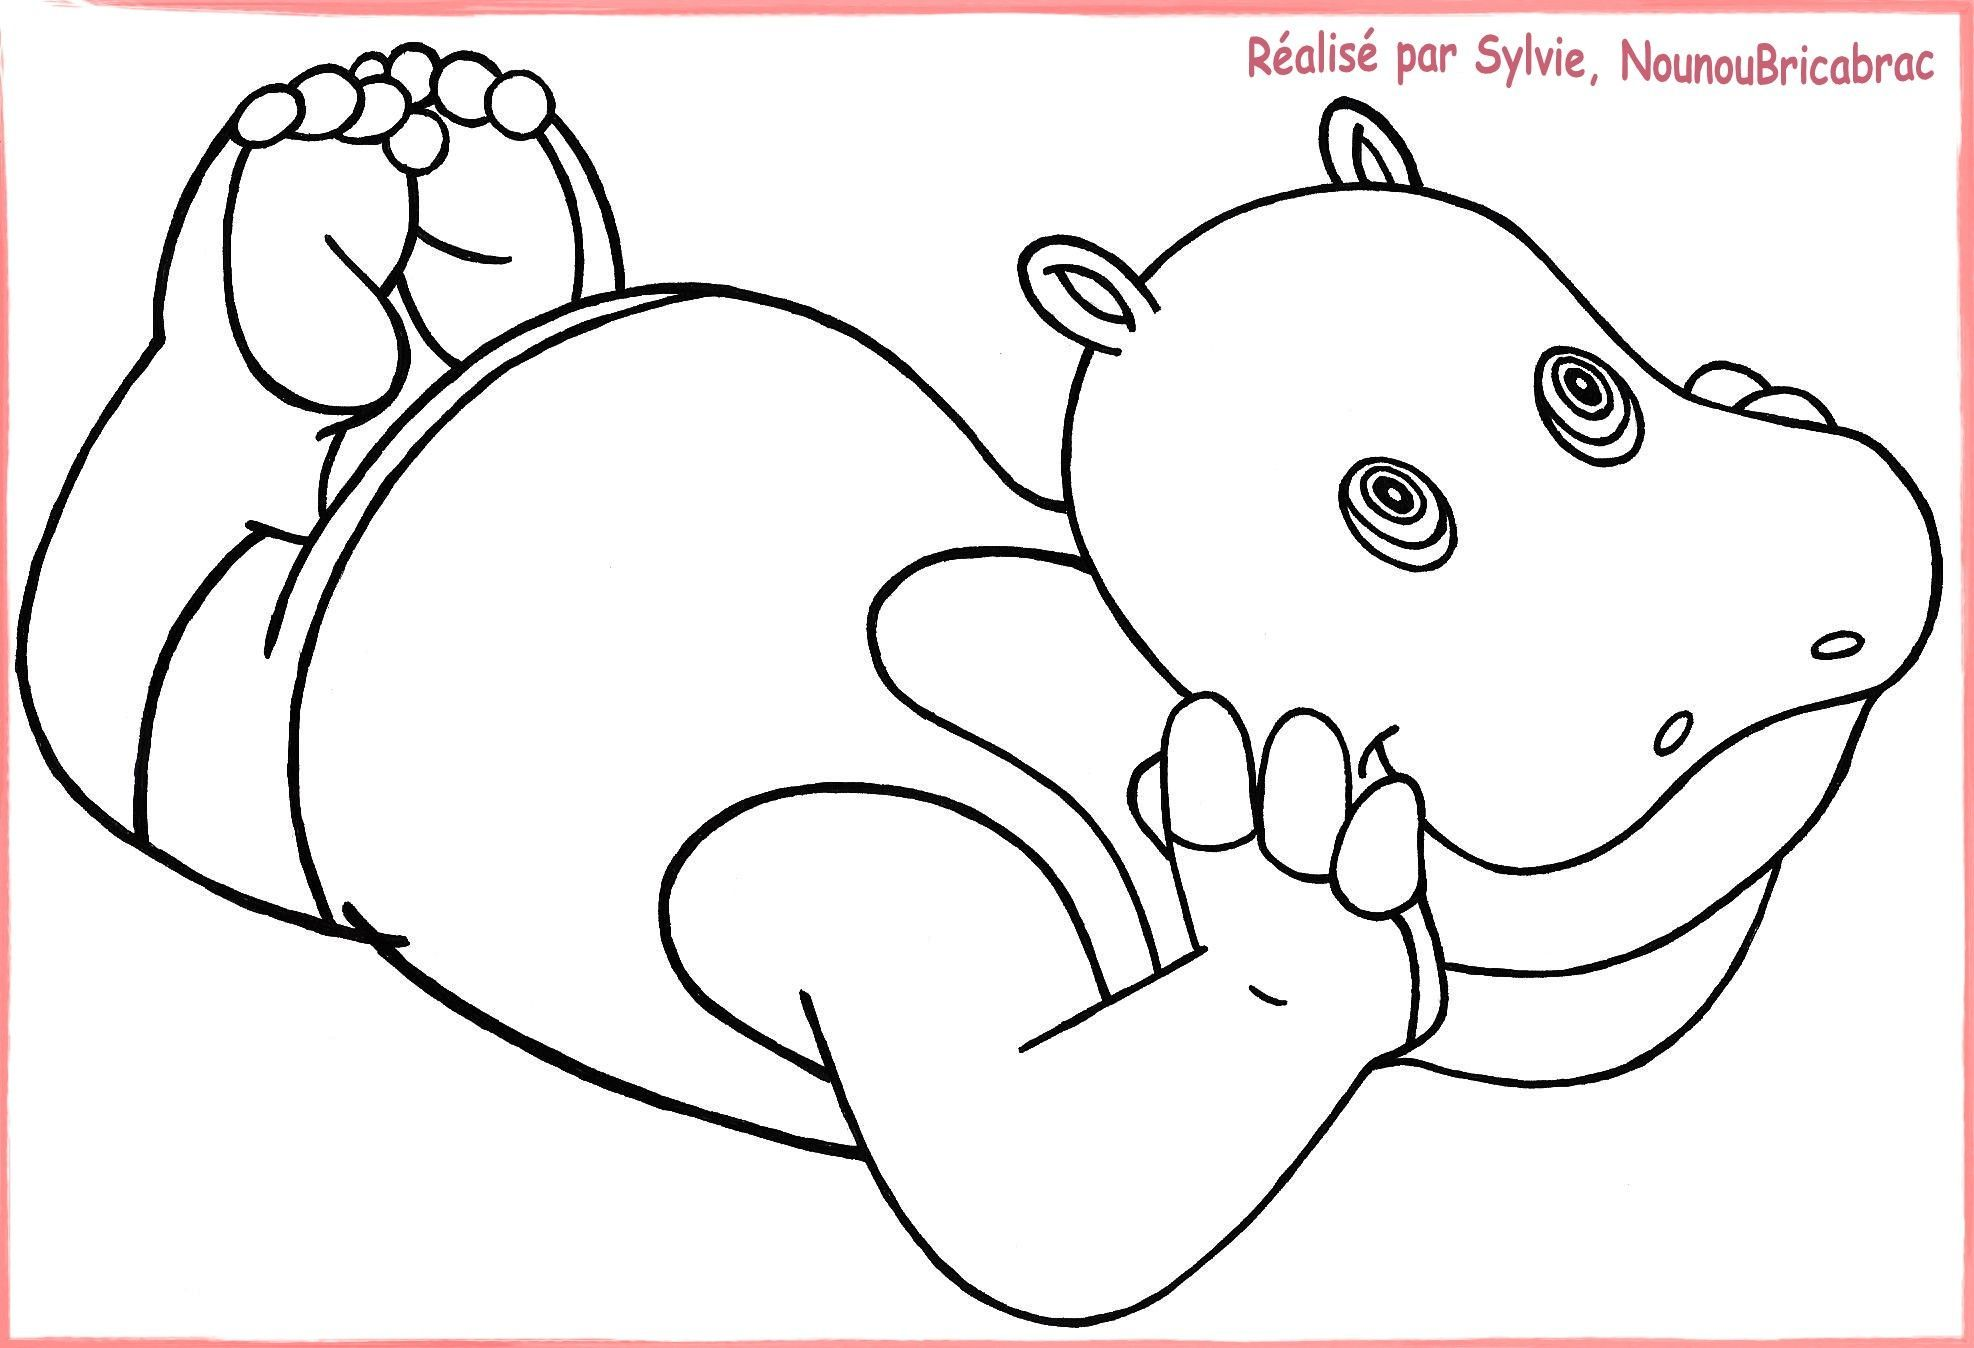 Coloriages animaux page 3 - Dessin d hippopotame ...